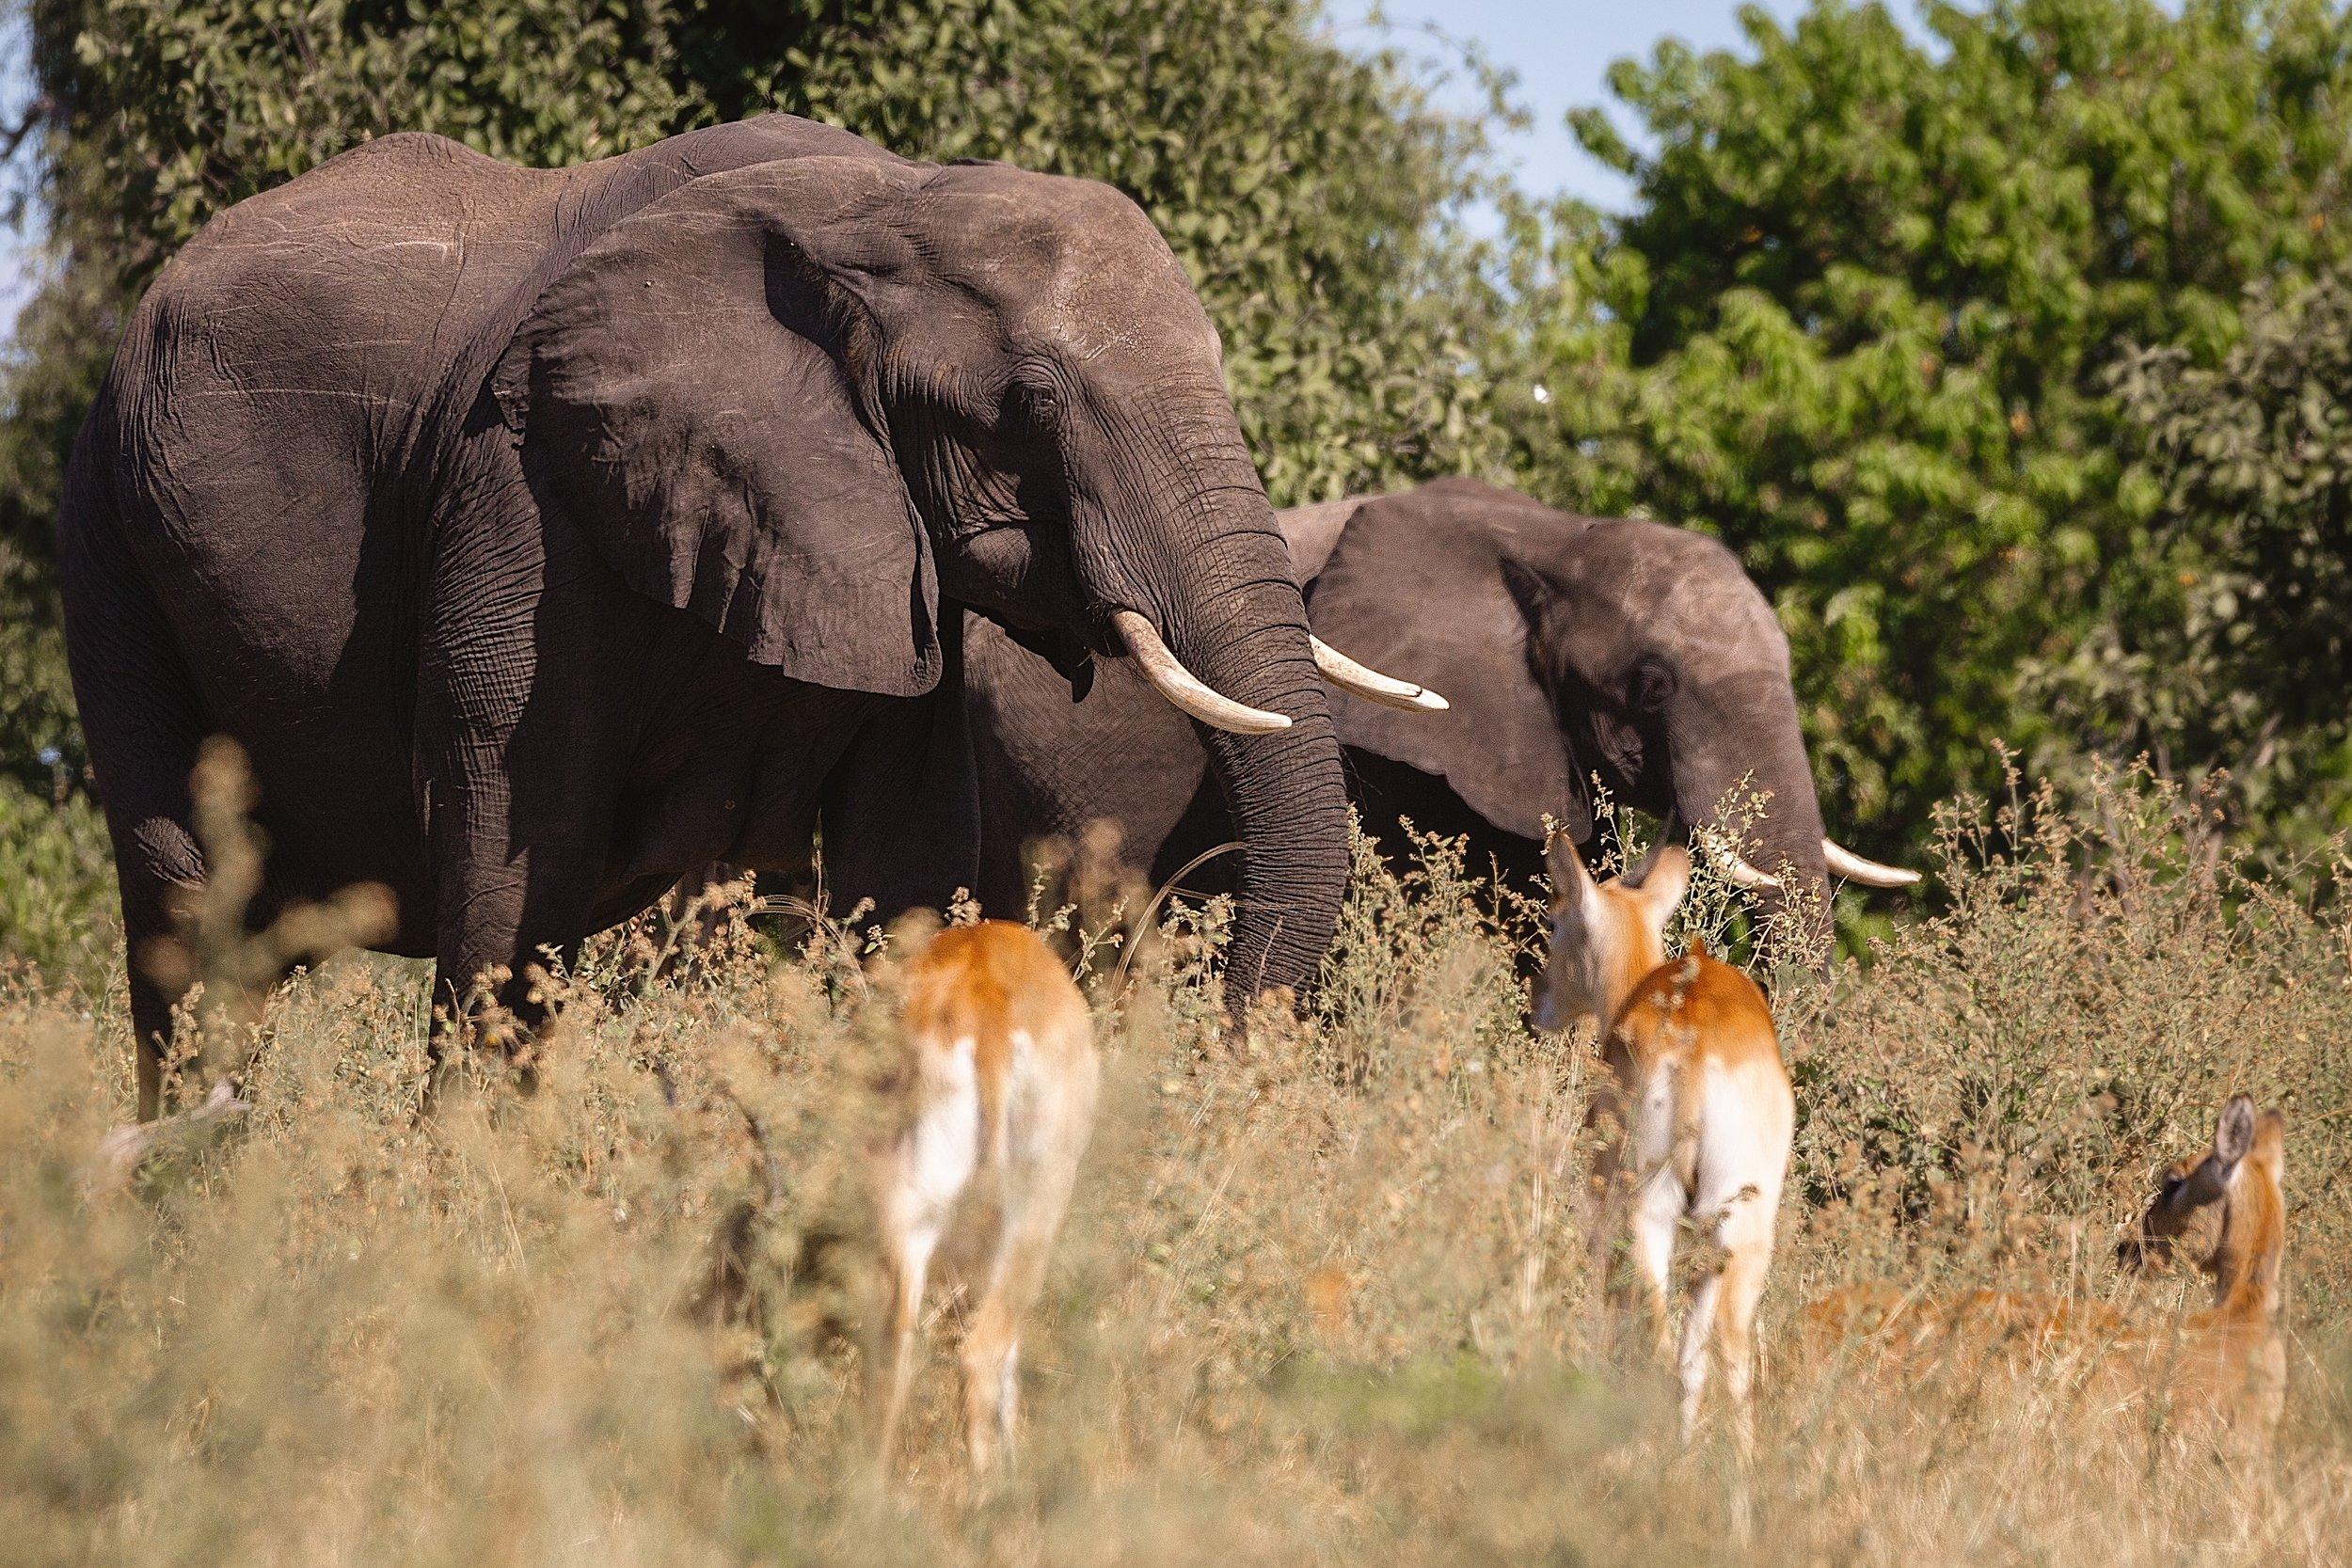 Elephants in Chobe National Park, Botswana. Photo by  Sander Wehkamp  on  Unsplash